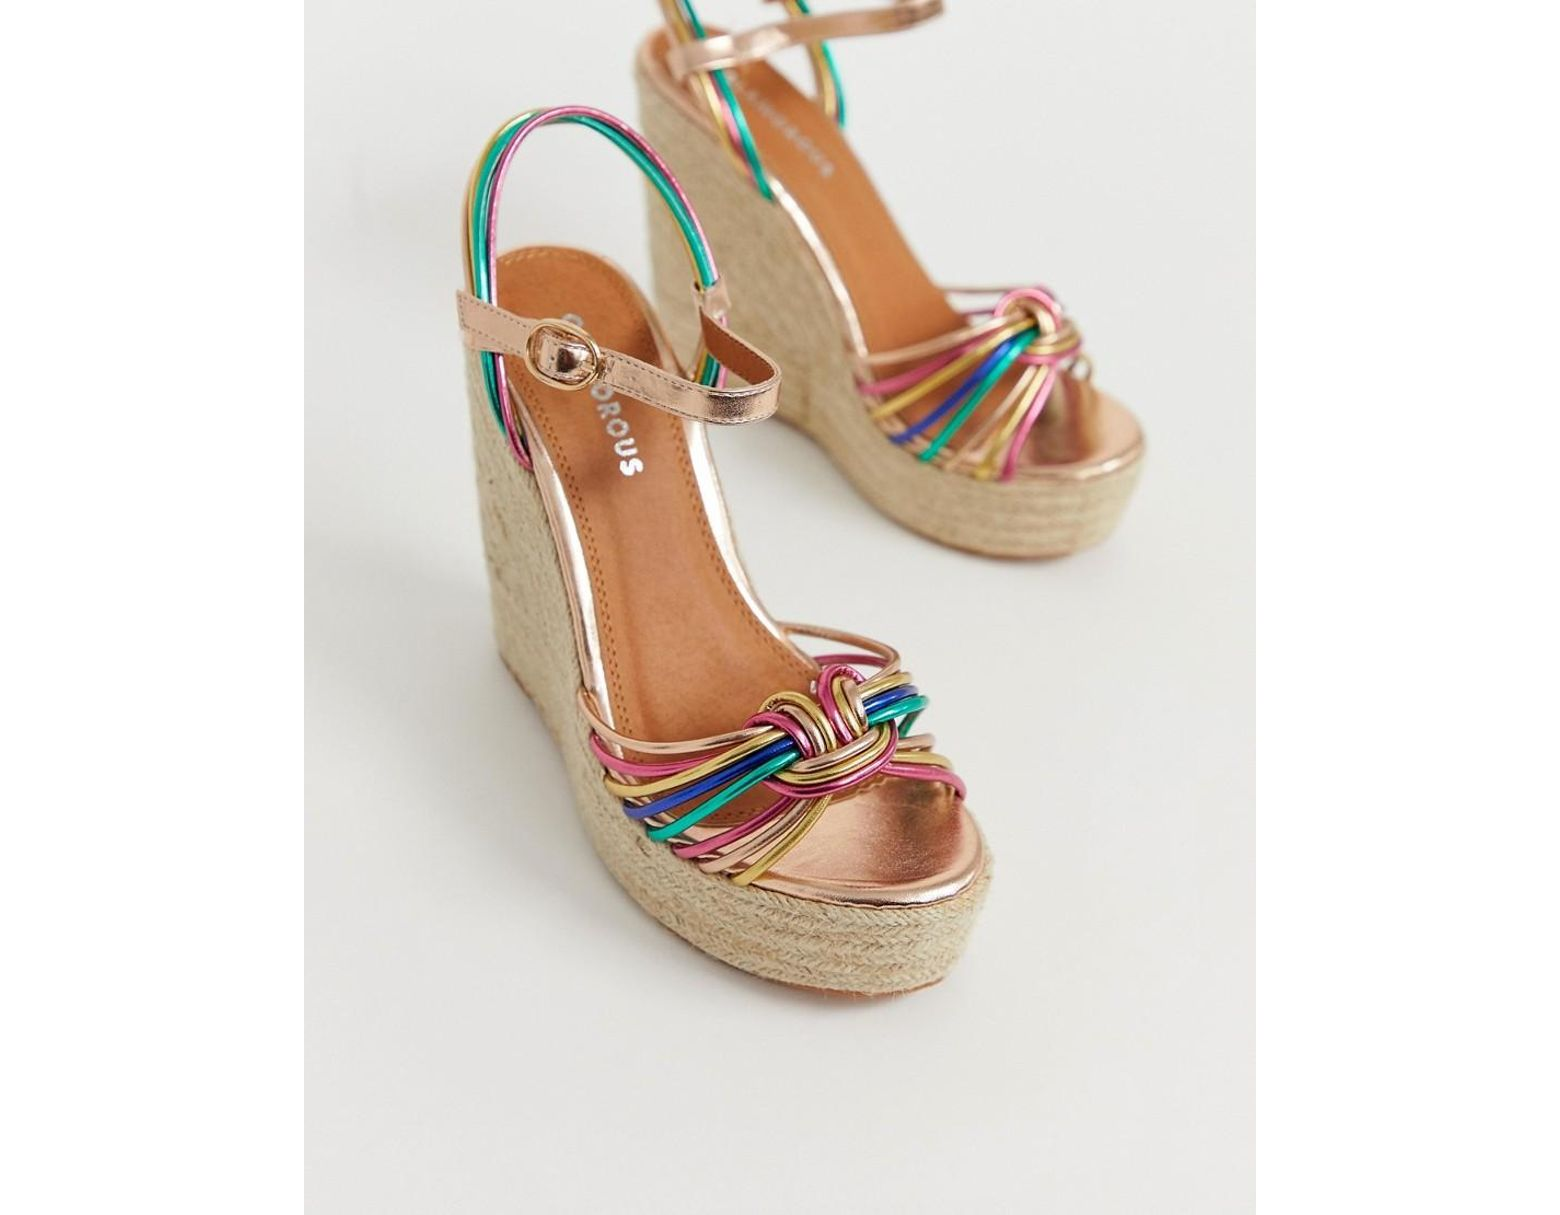 00efe946c94 Glamorous Multicoloured Espadrille Wedge Sandals - Lyst